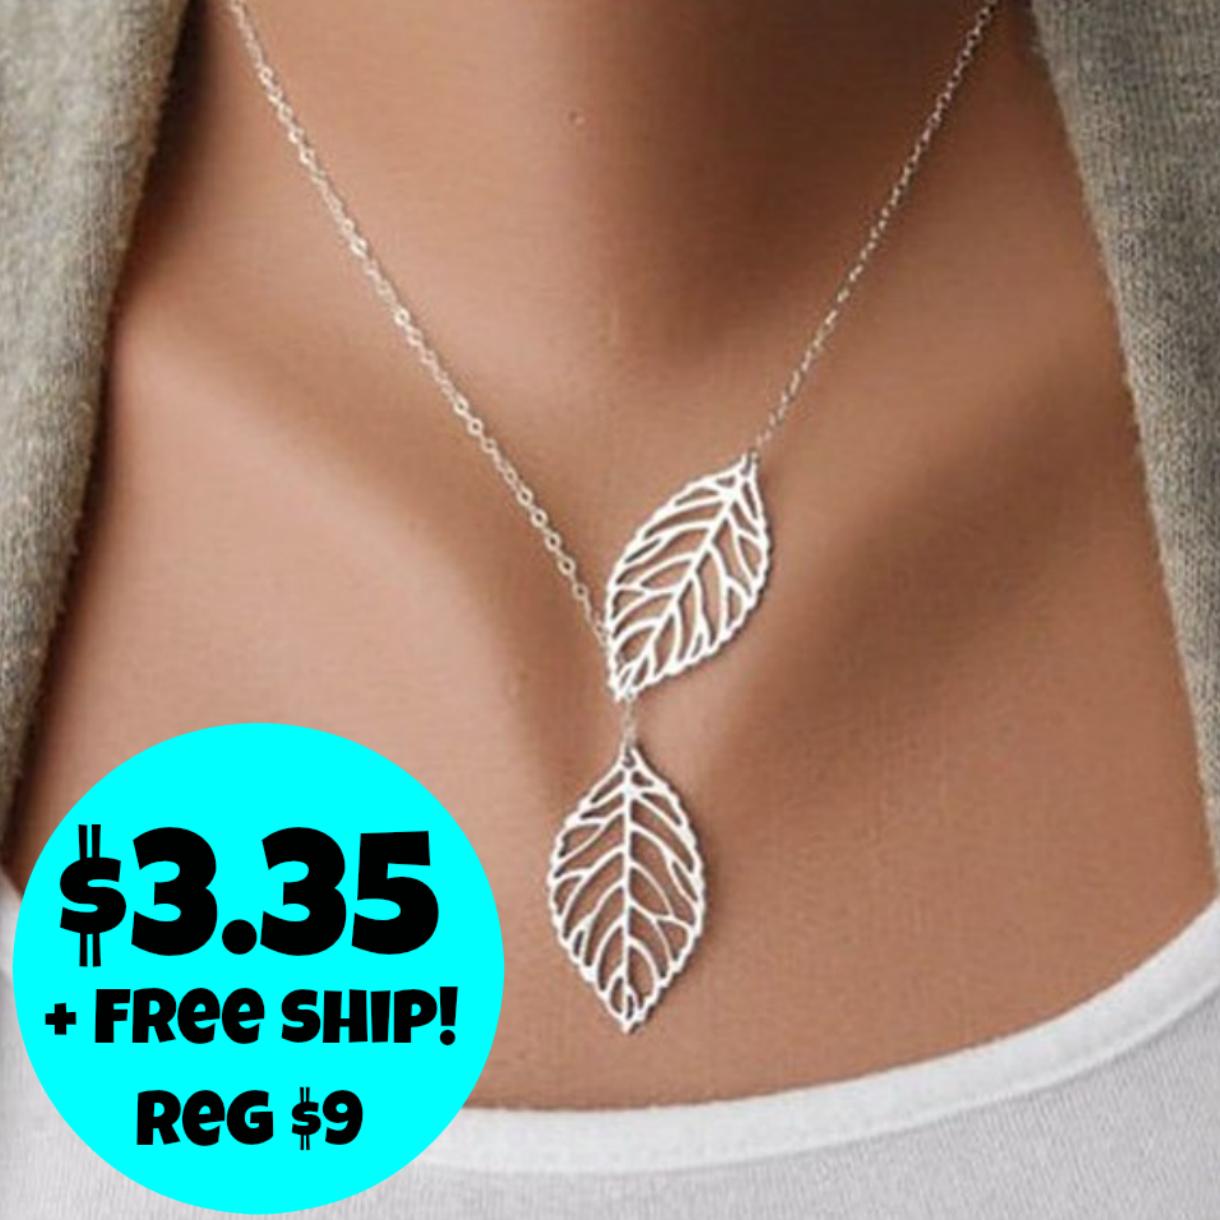 http://www.thebinderladies.com/2015/02/amazon-susenstone-double-leaf-pendant.html#.VNLXiYfduyM